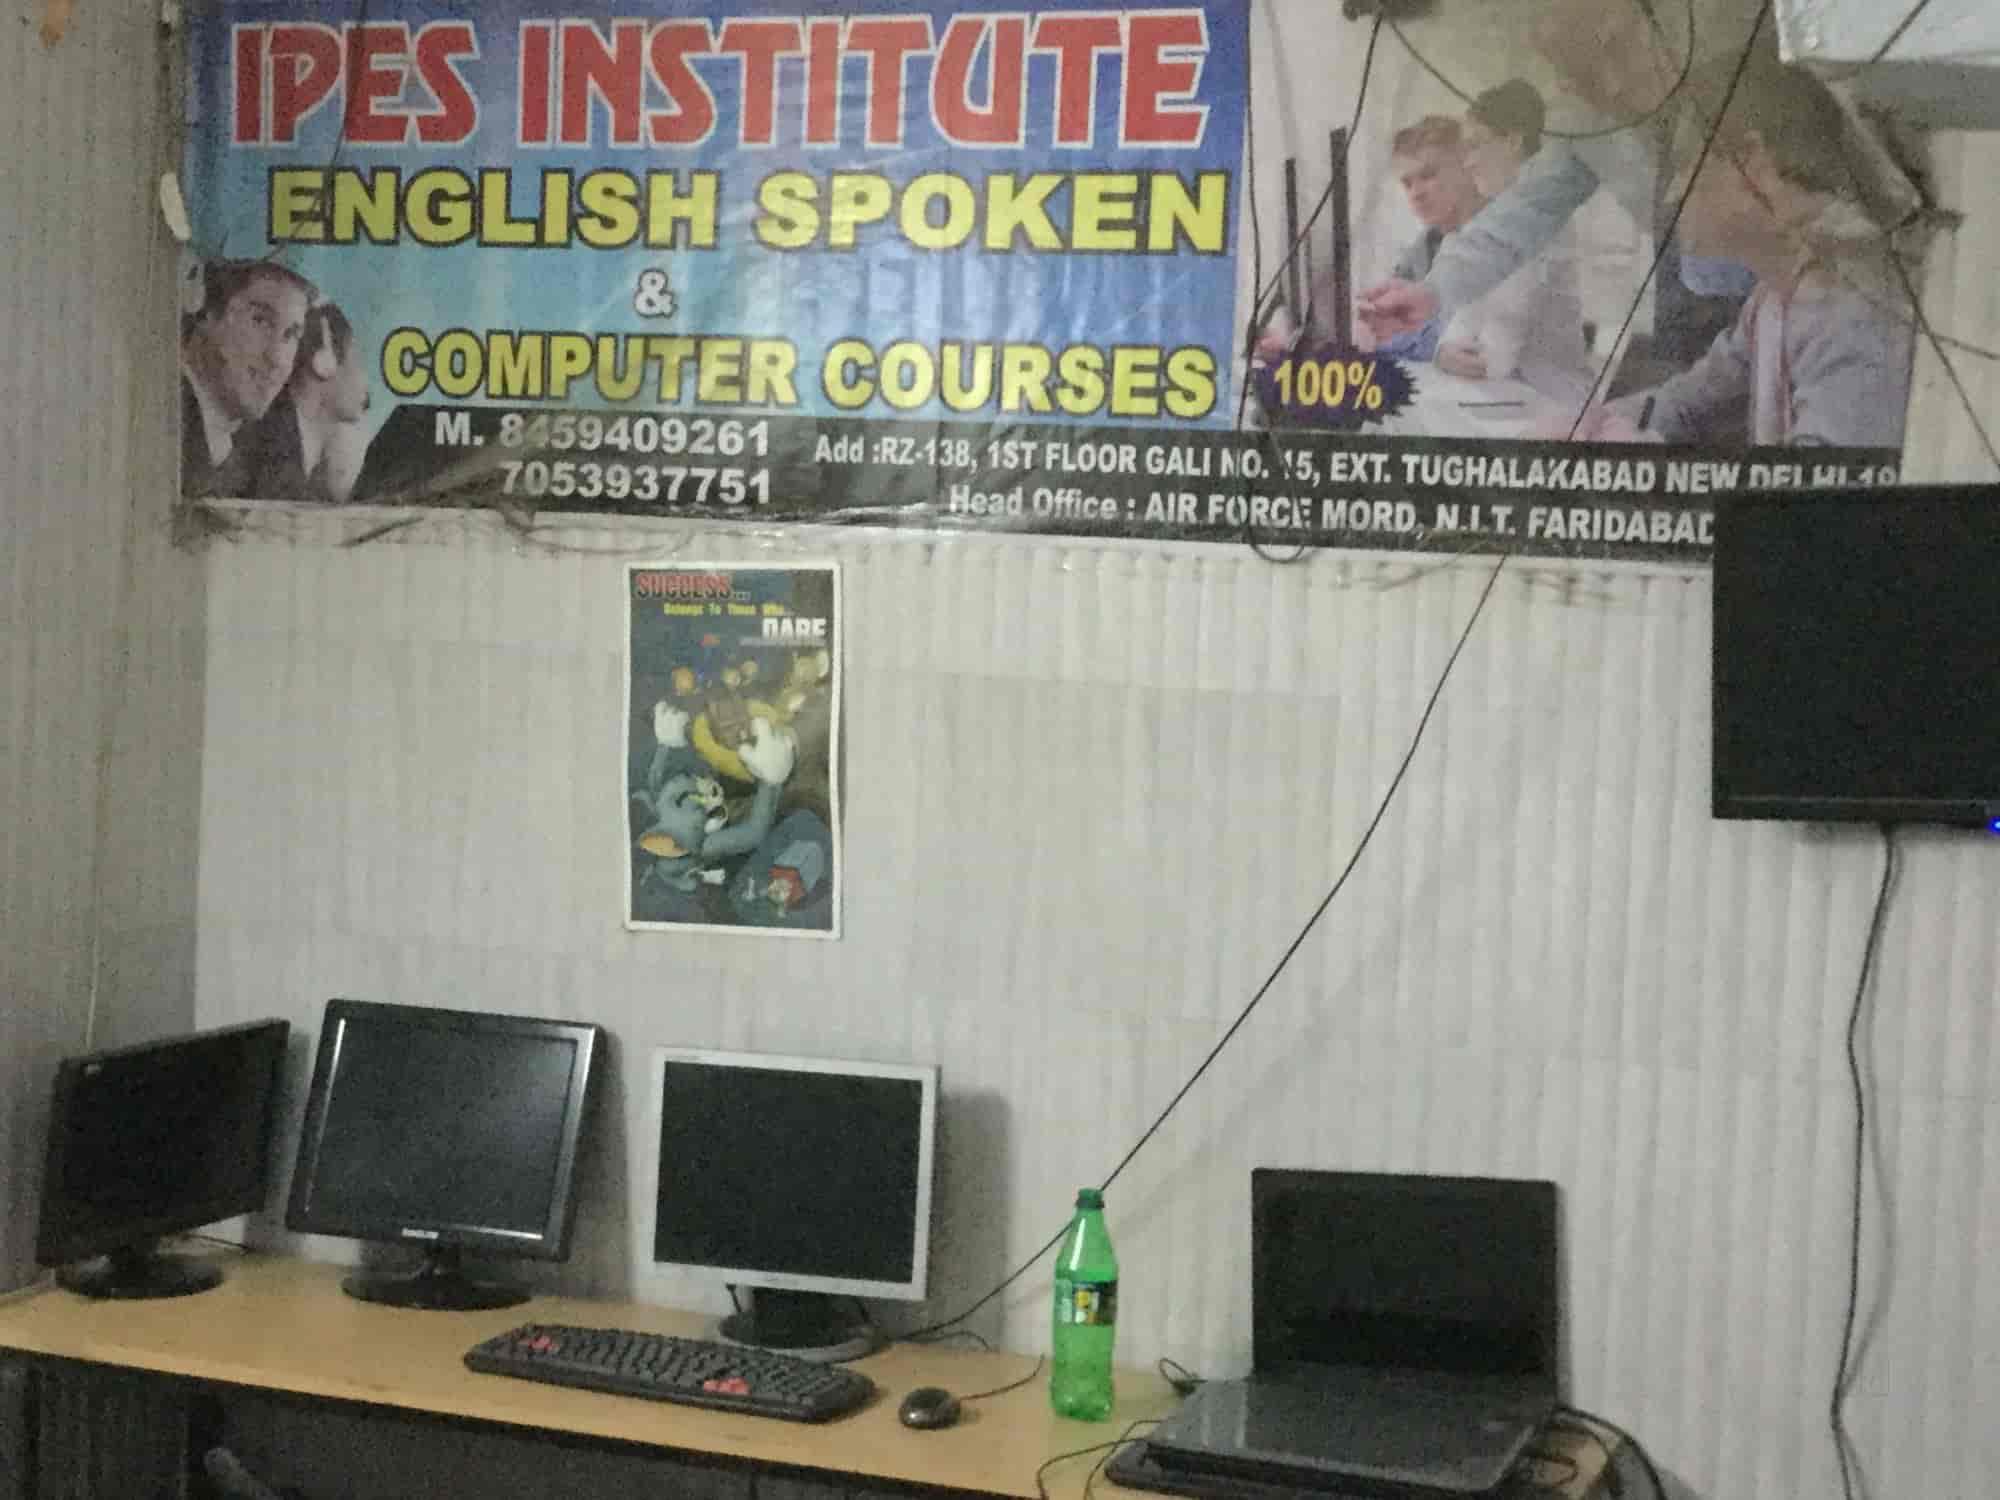 nouveaux styles 33089 ba130 IPES Education Management Photos, Tughlakabad Extension ...